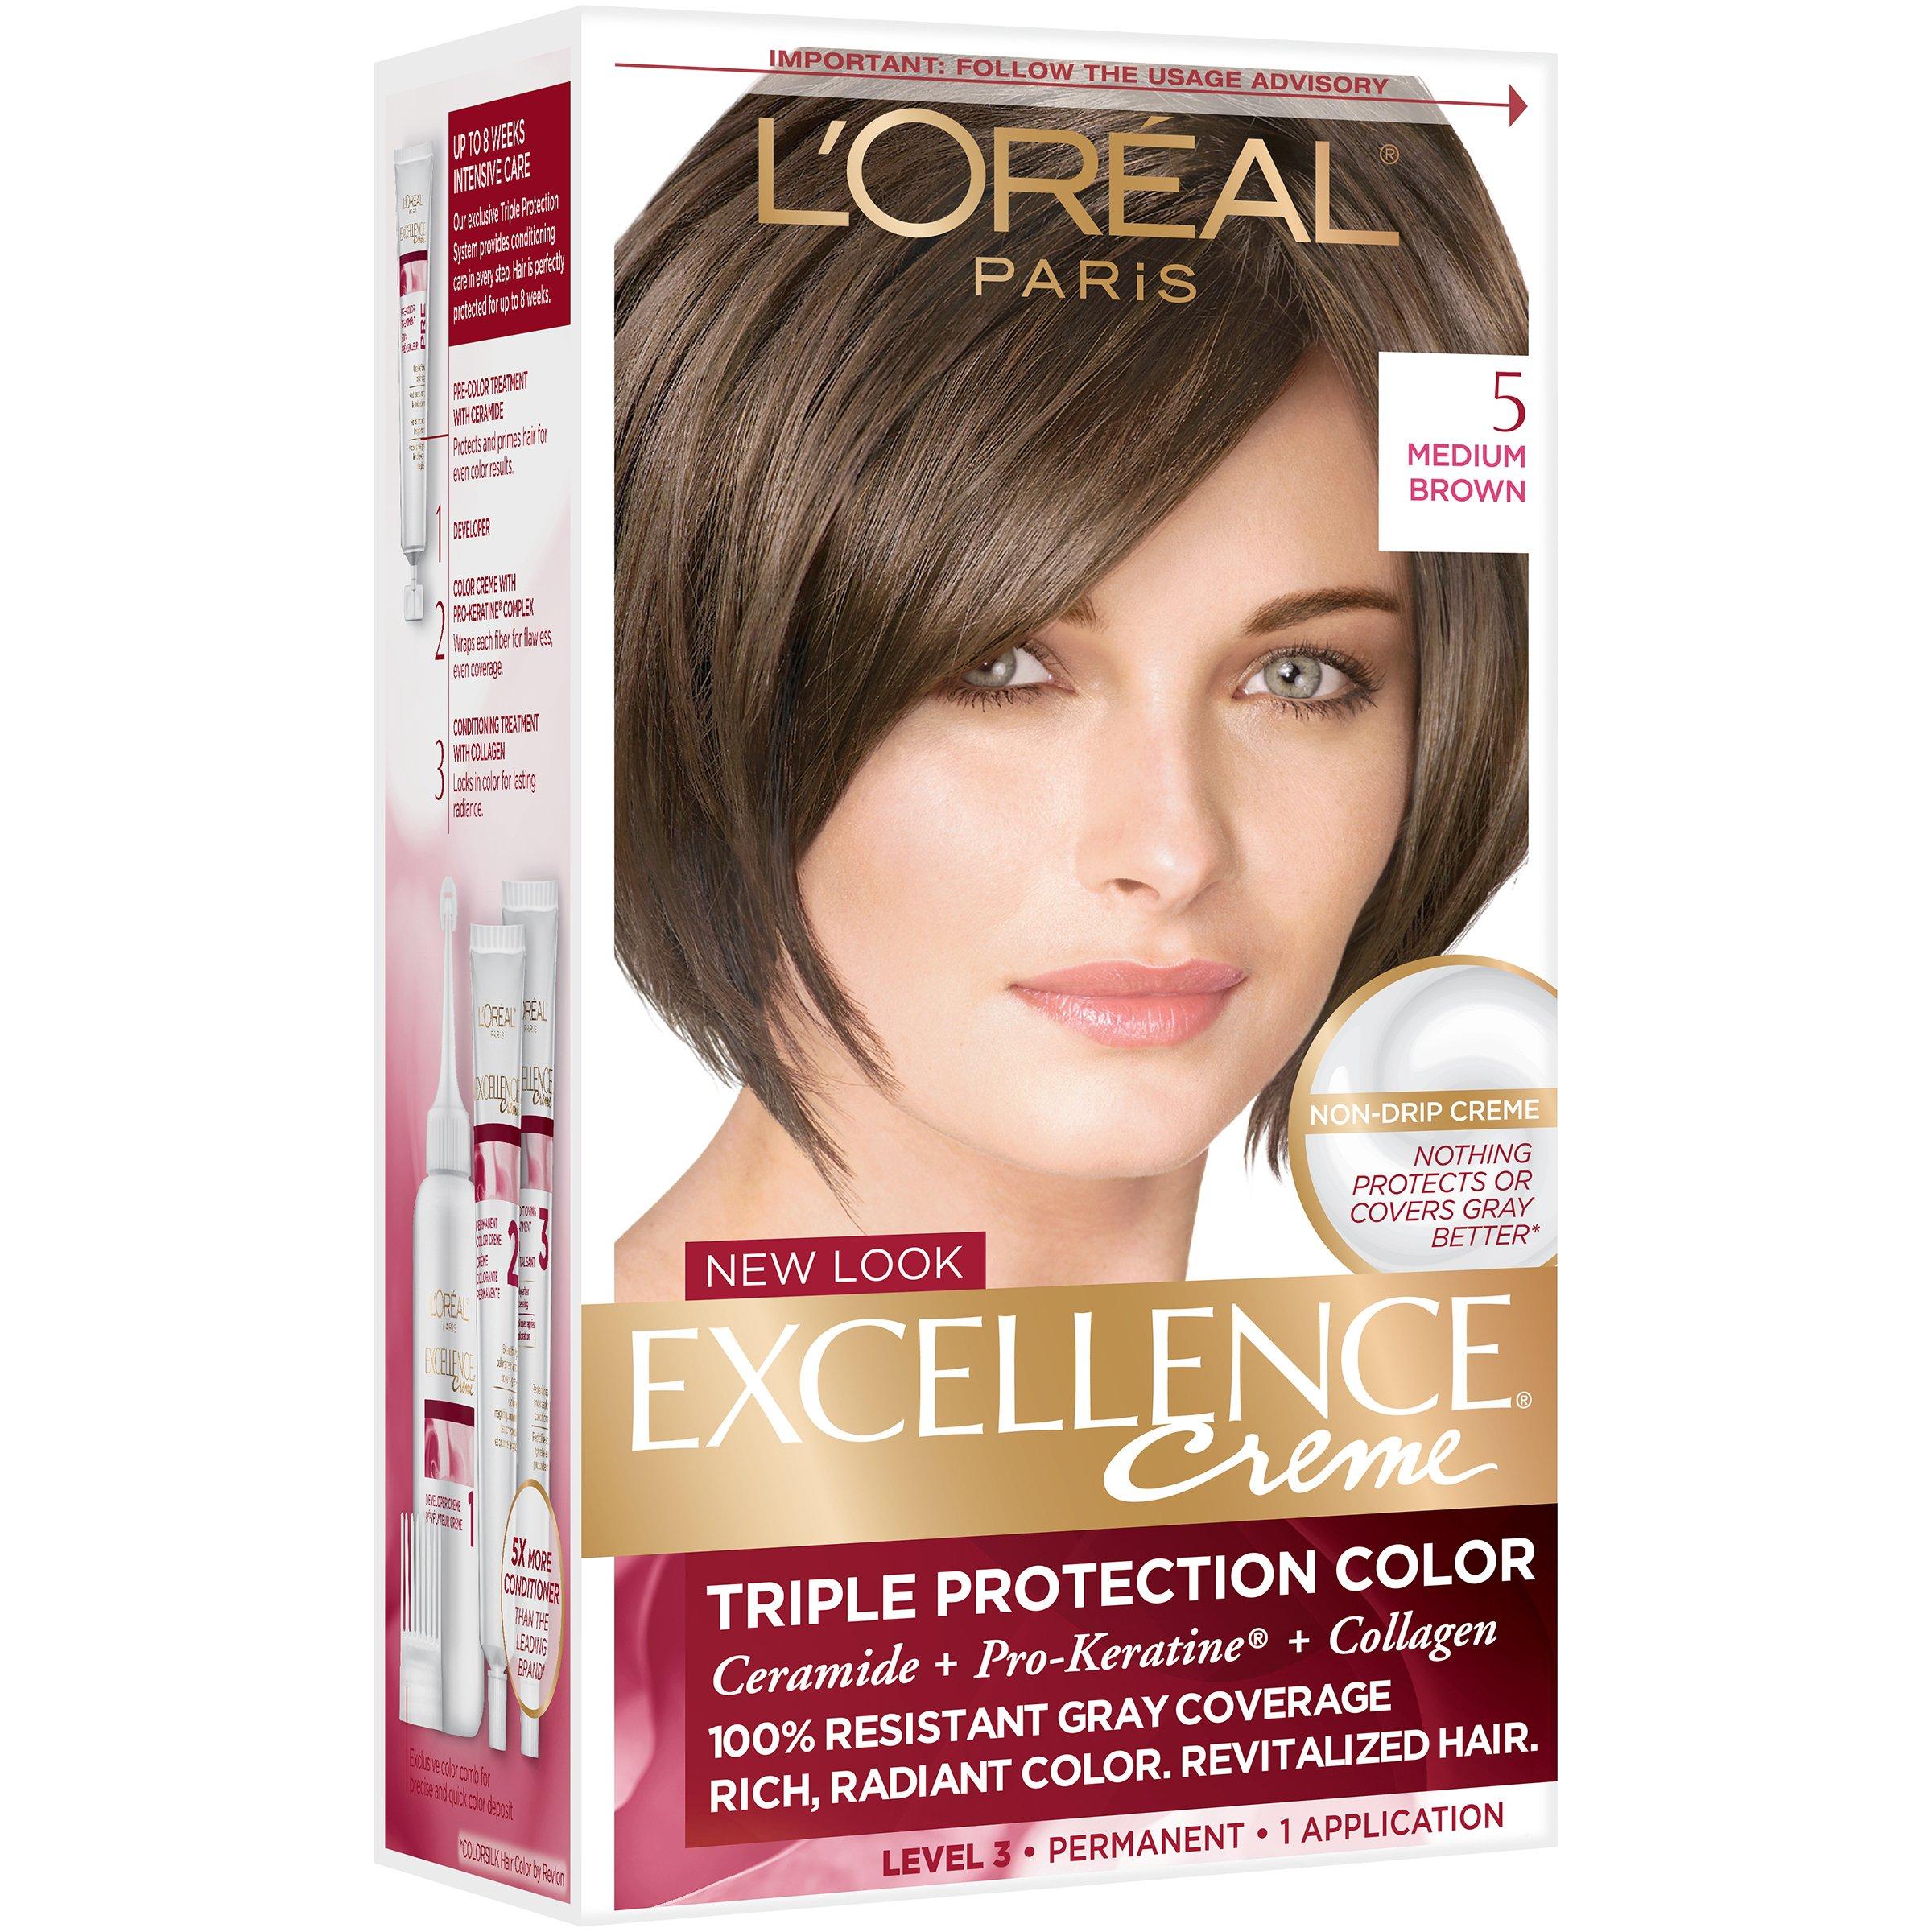 Bigen Hair Color During Pregnancy